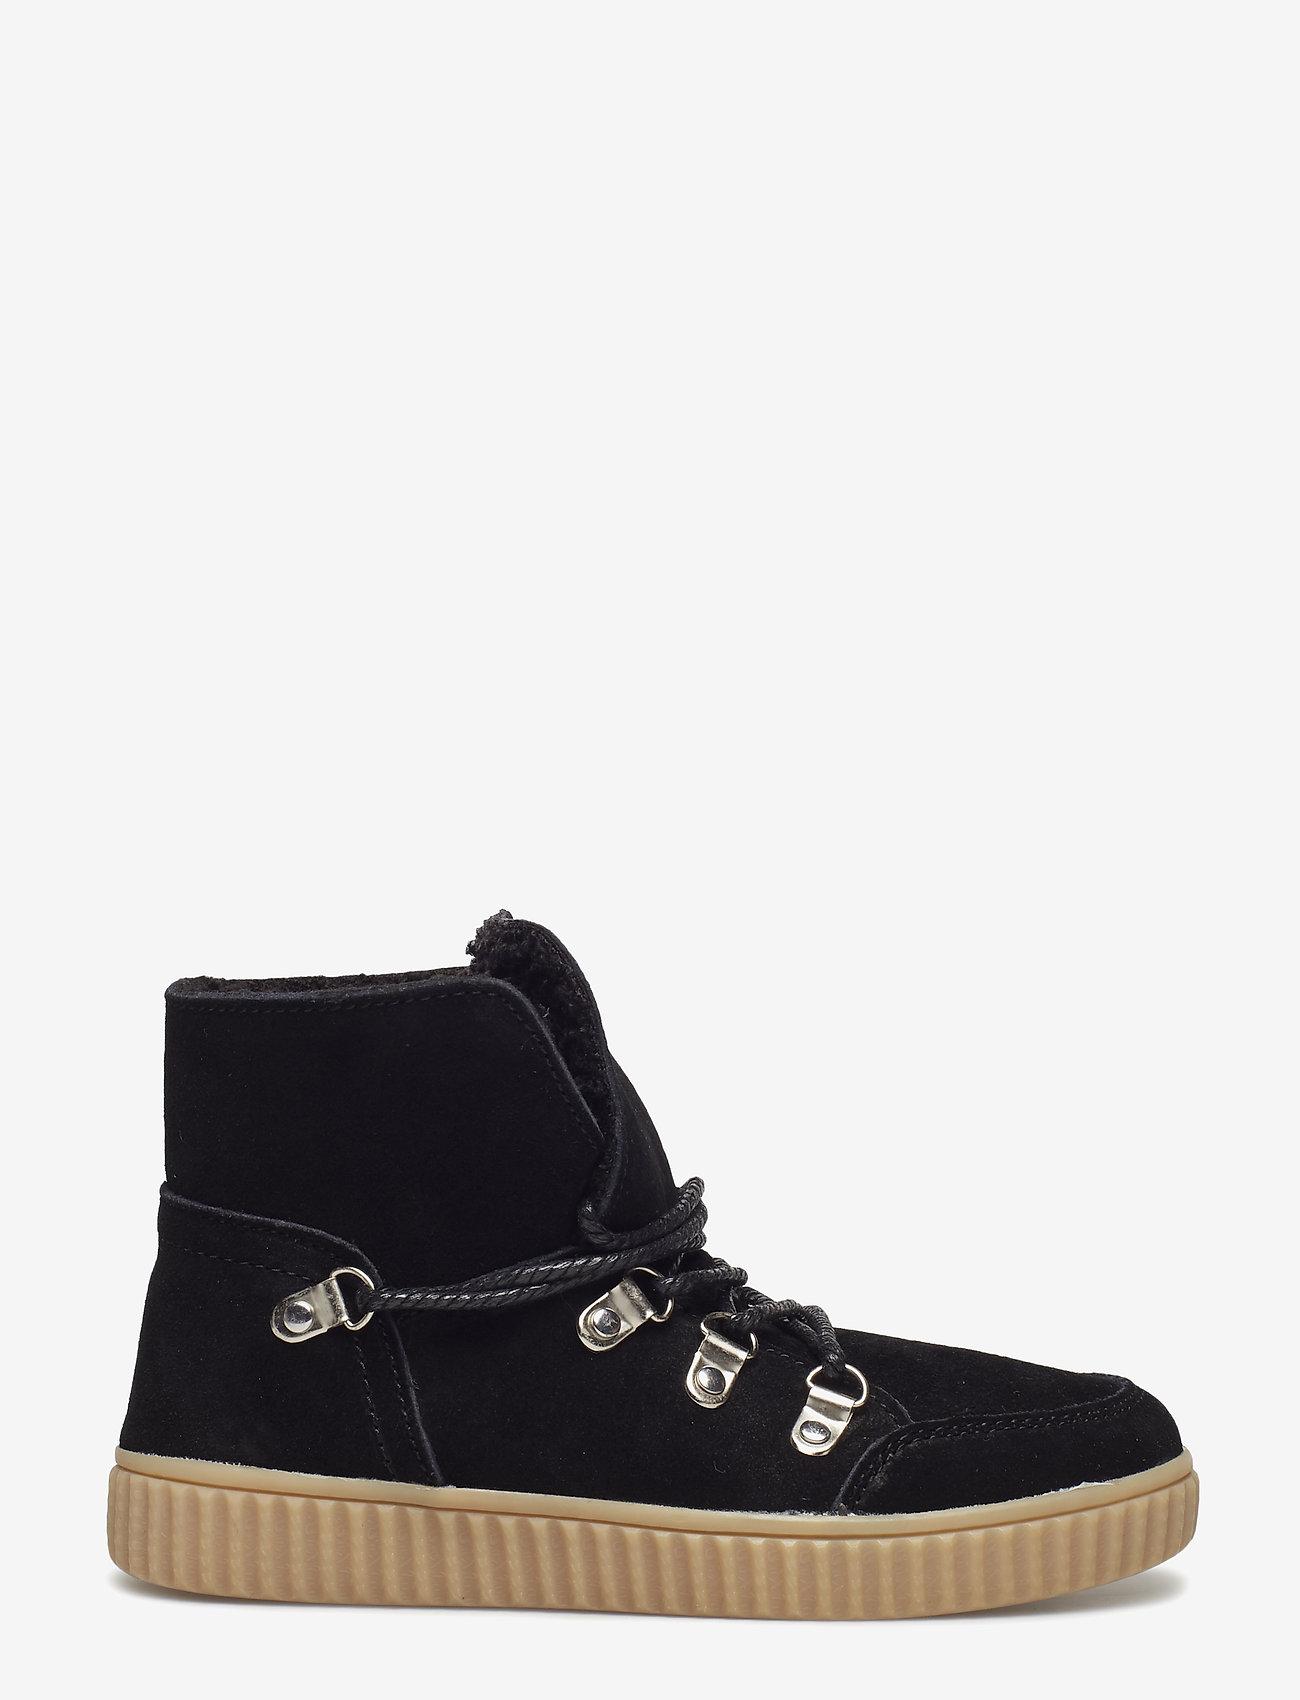 Petit by Sofie Schnoor - Boot sneak - bottes d'hiver - black - 1